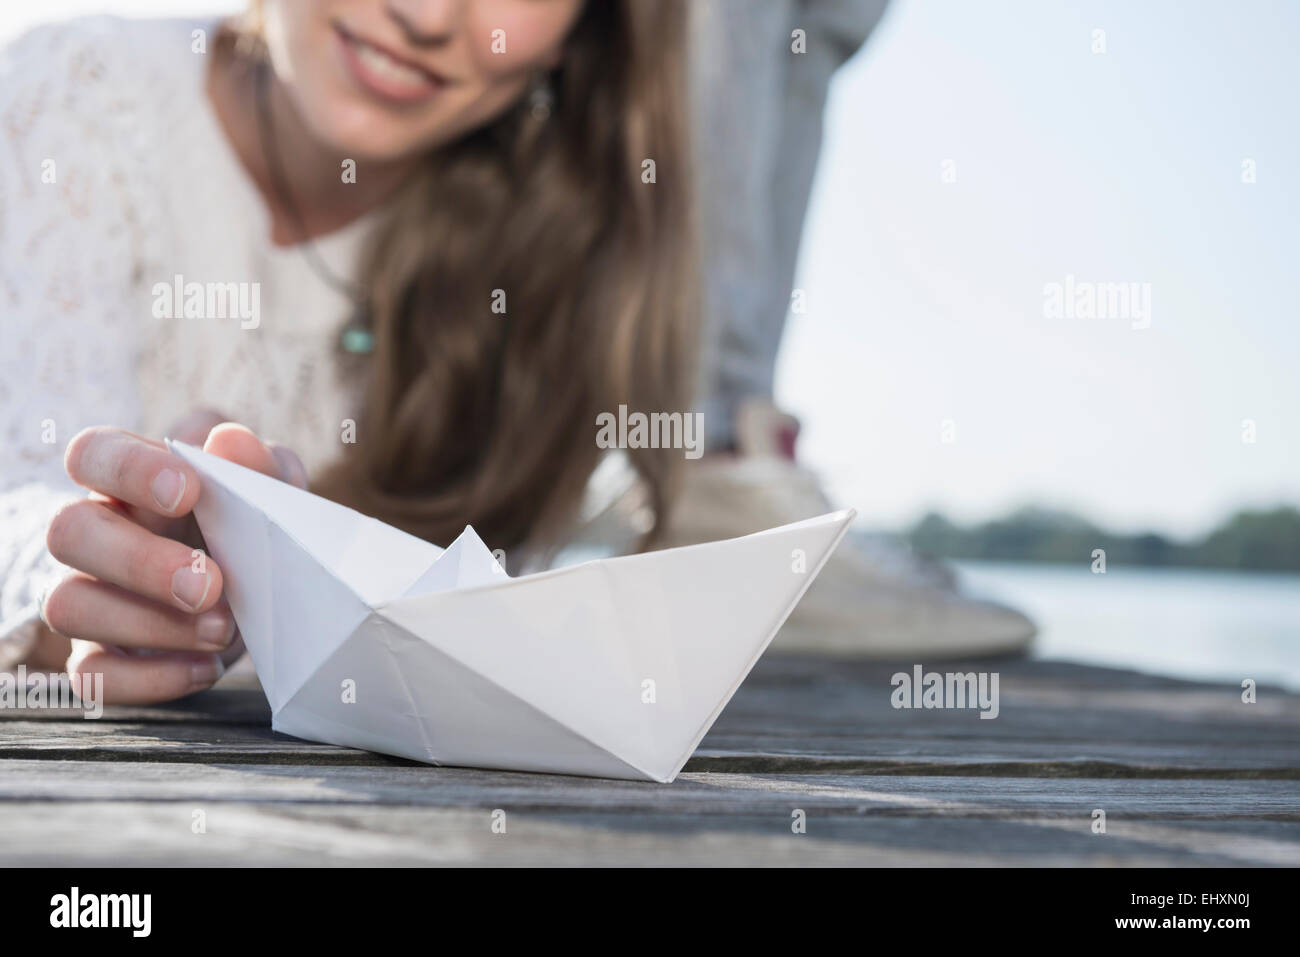 Frau mit weißem Papier Boot Detail hautnah Stockbild